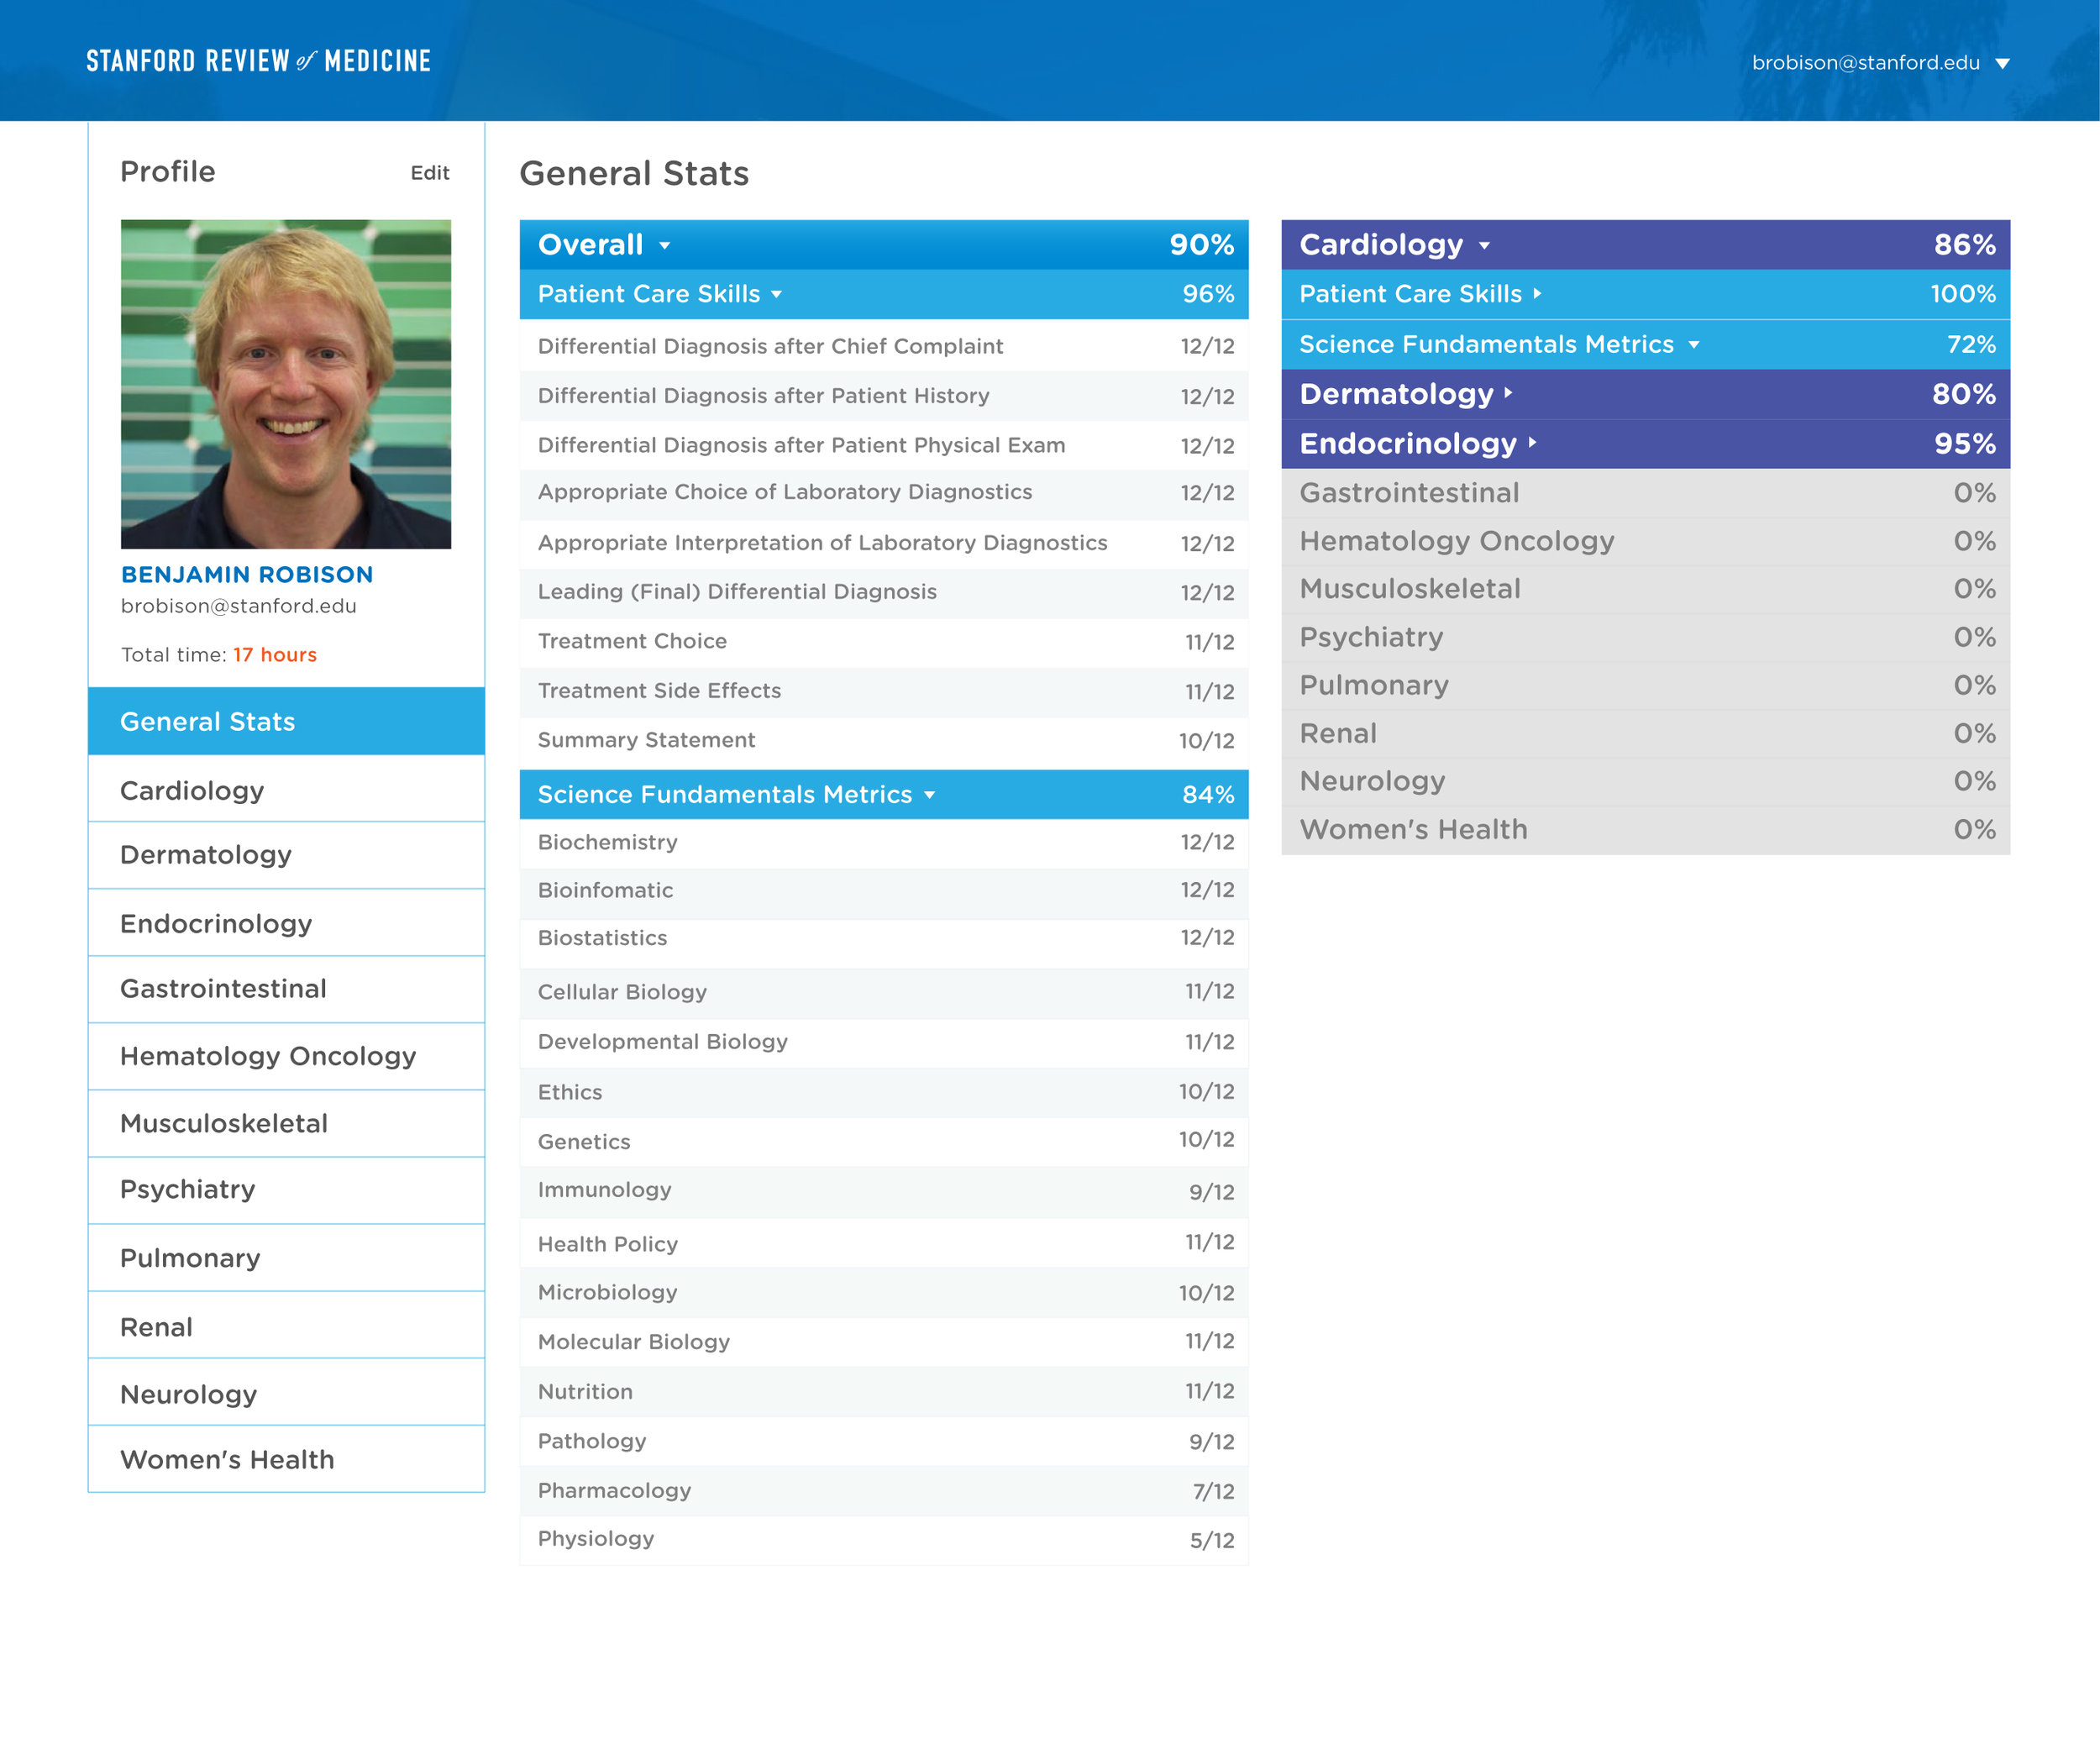 srm-laptop-06-user-profile-1-generalstats.jpg